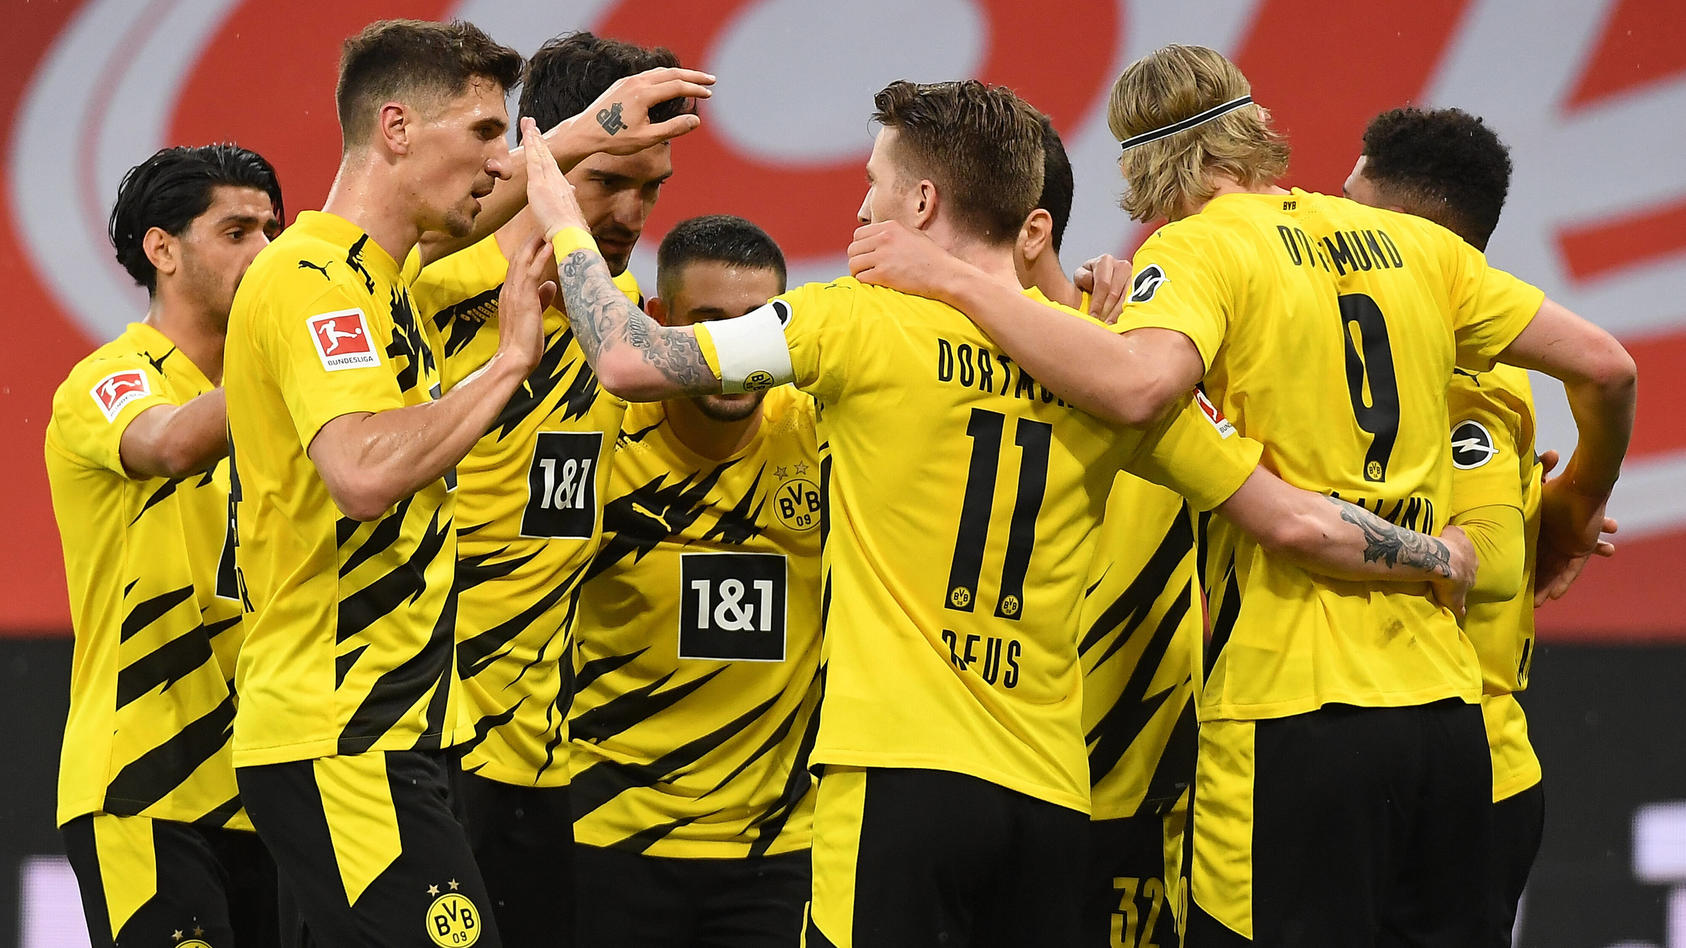 Borussia Dortmund gewann drei Tage nach dem Pokalfinale auch in Mainz.